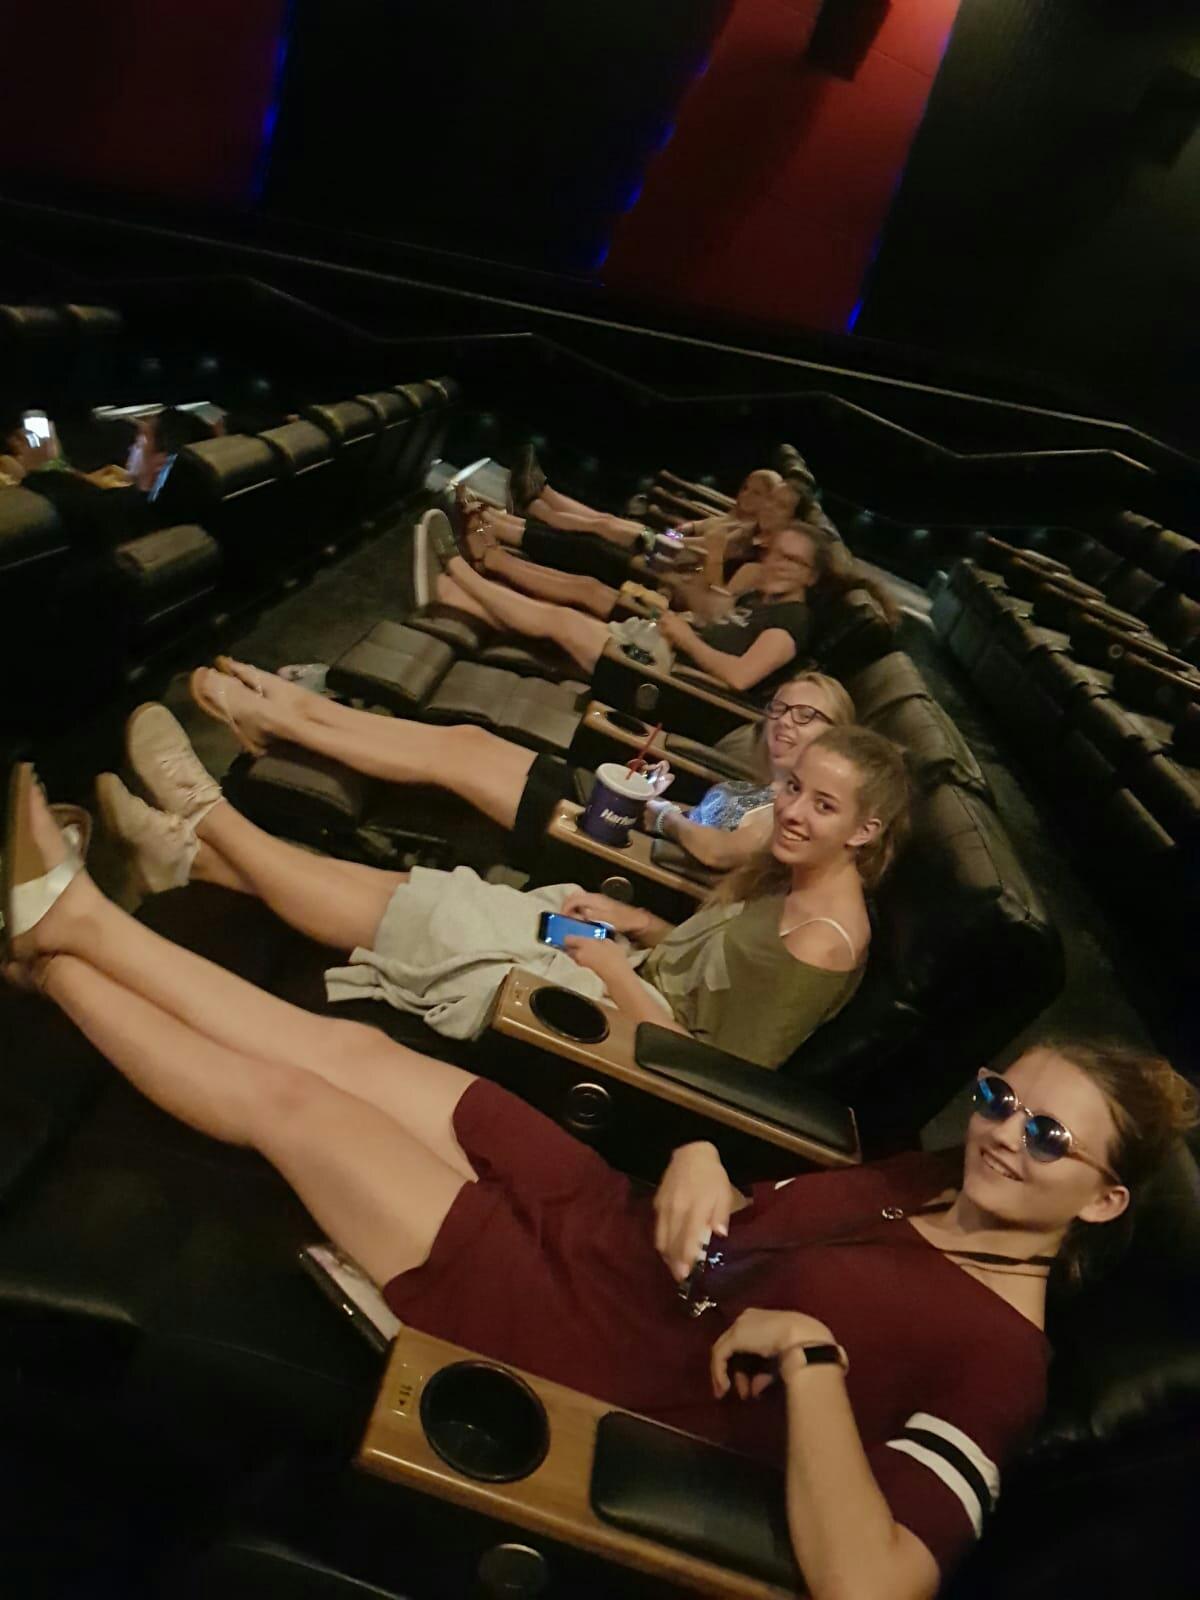 Loungesessel im Kino